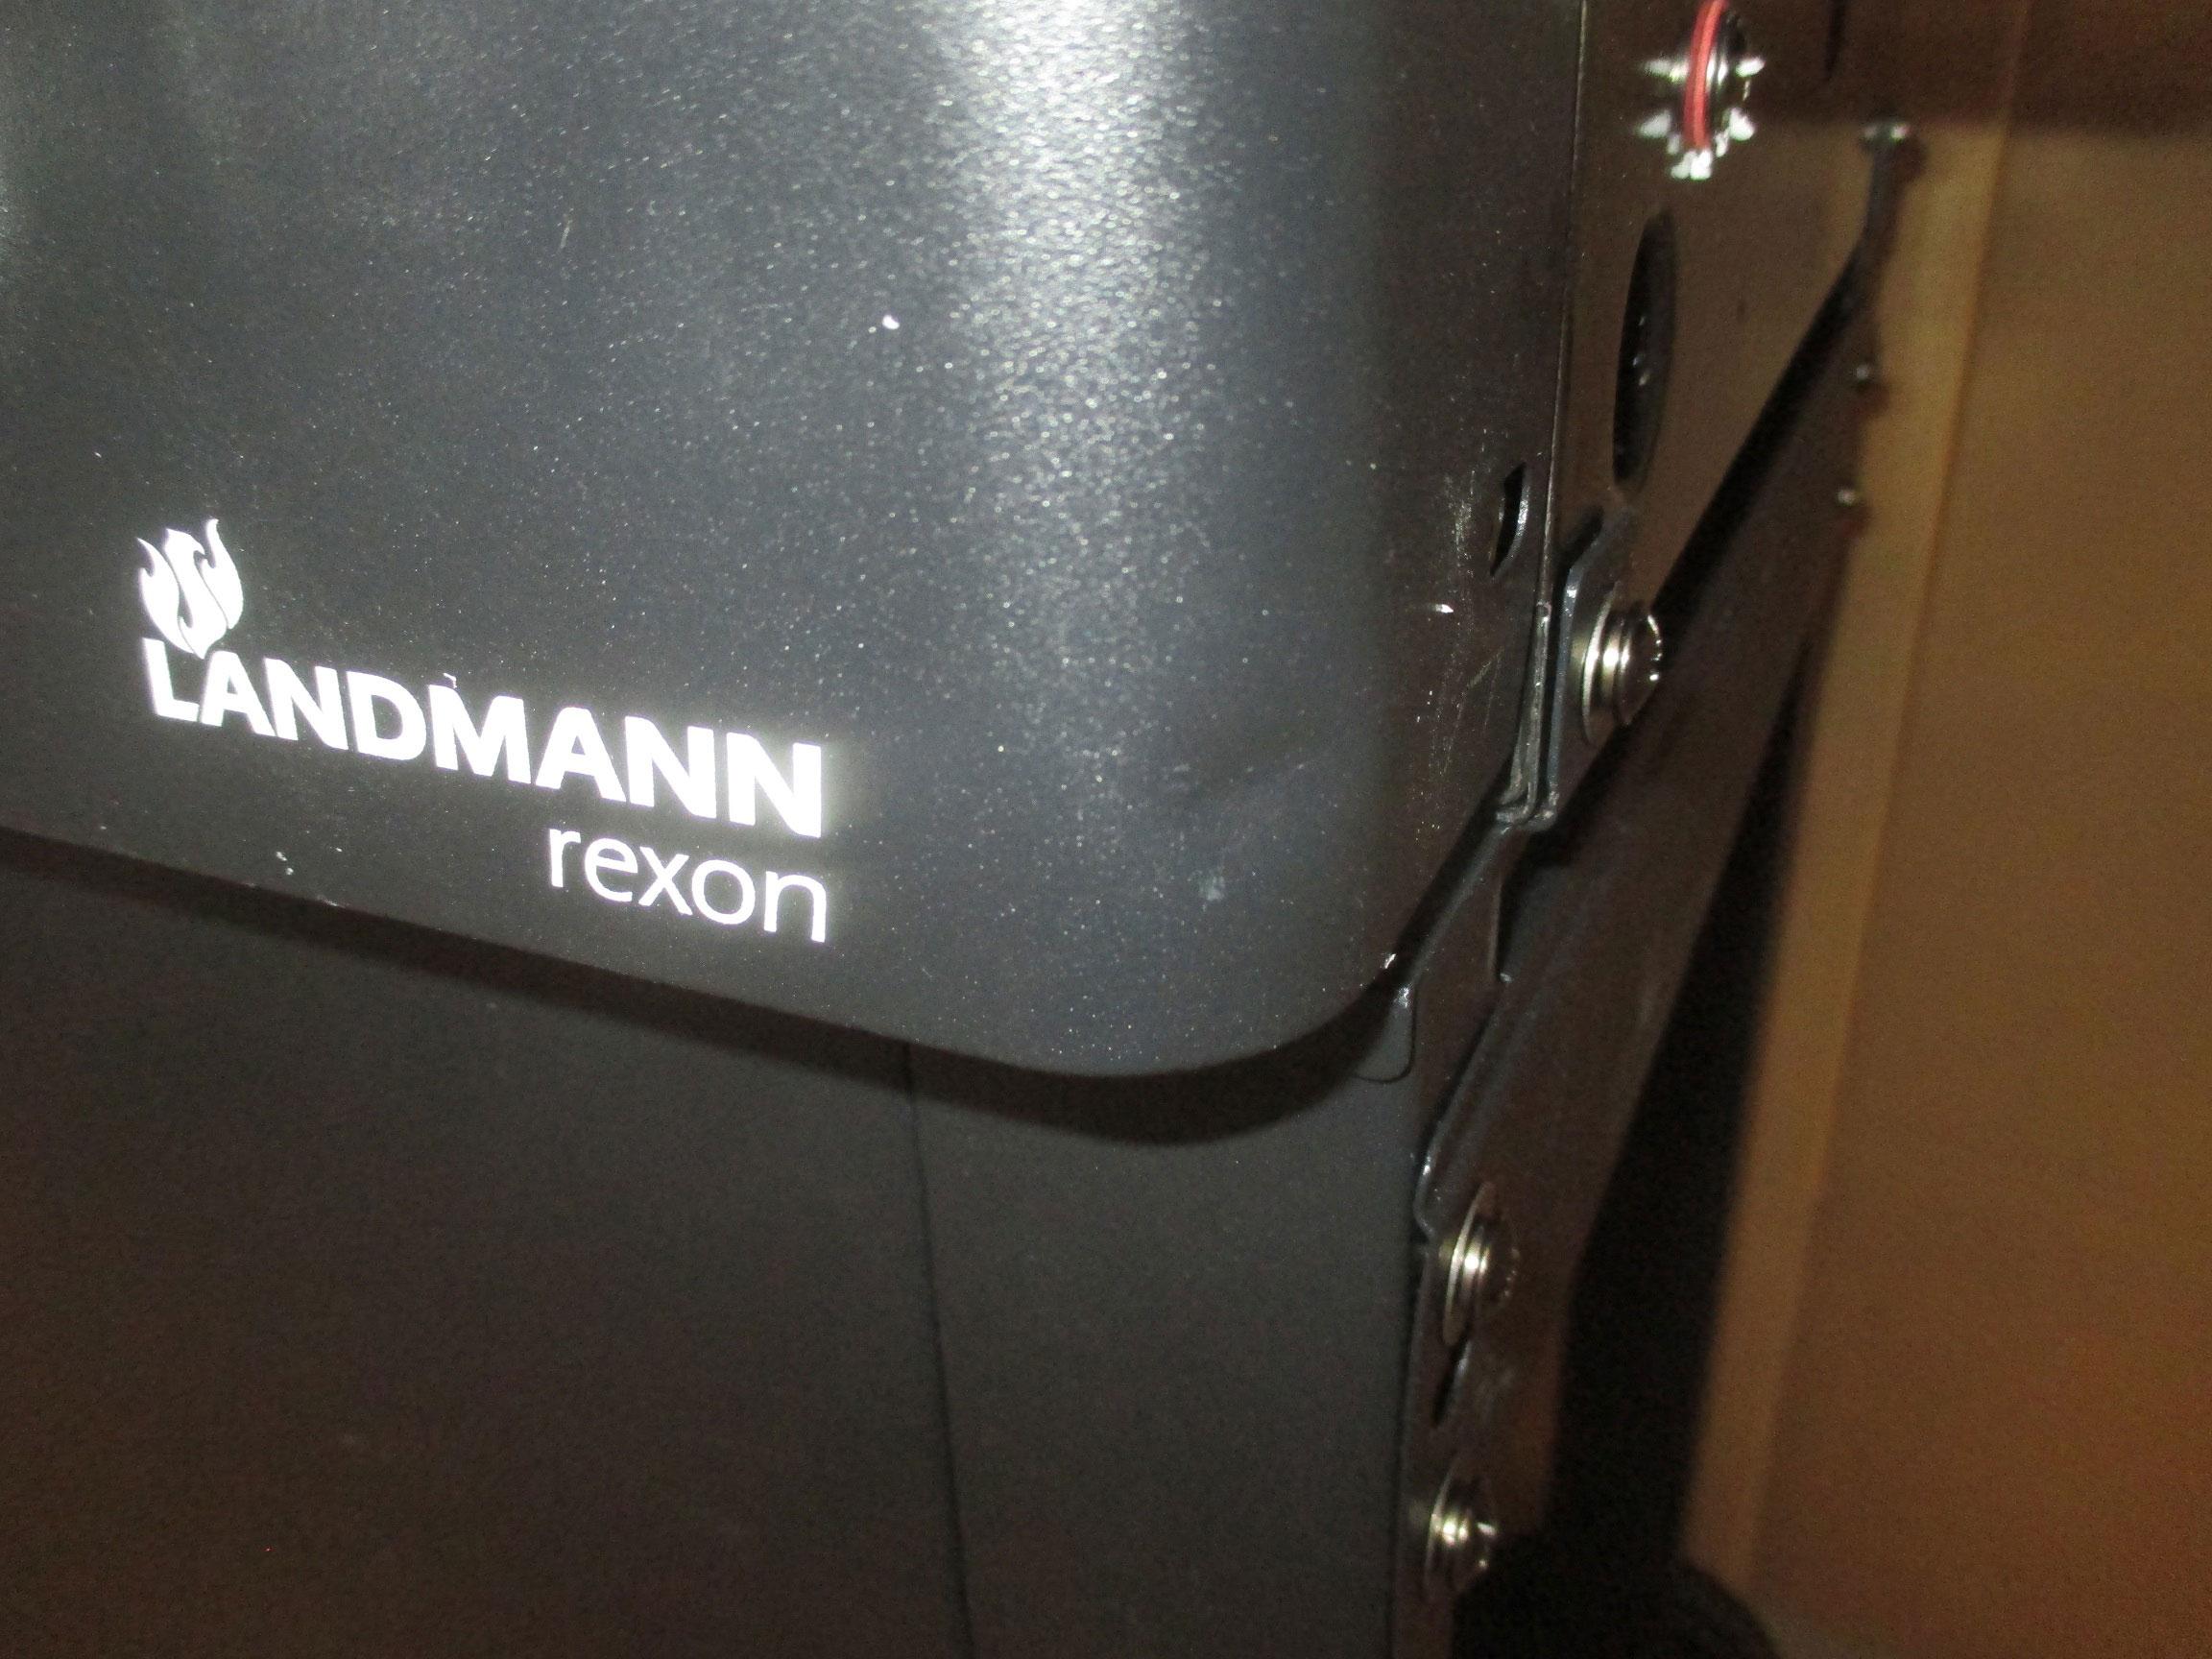 B-Ware Landmann Gasgrillwagen Rexon PTS 3.0 Grillfläche 64x40cm 12229 Bild 9